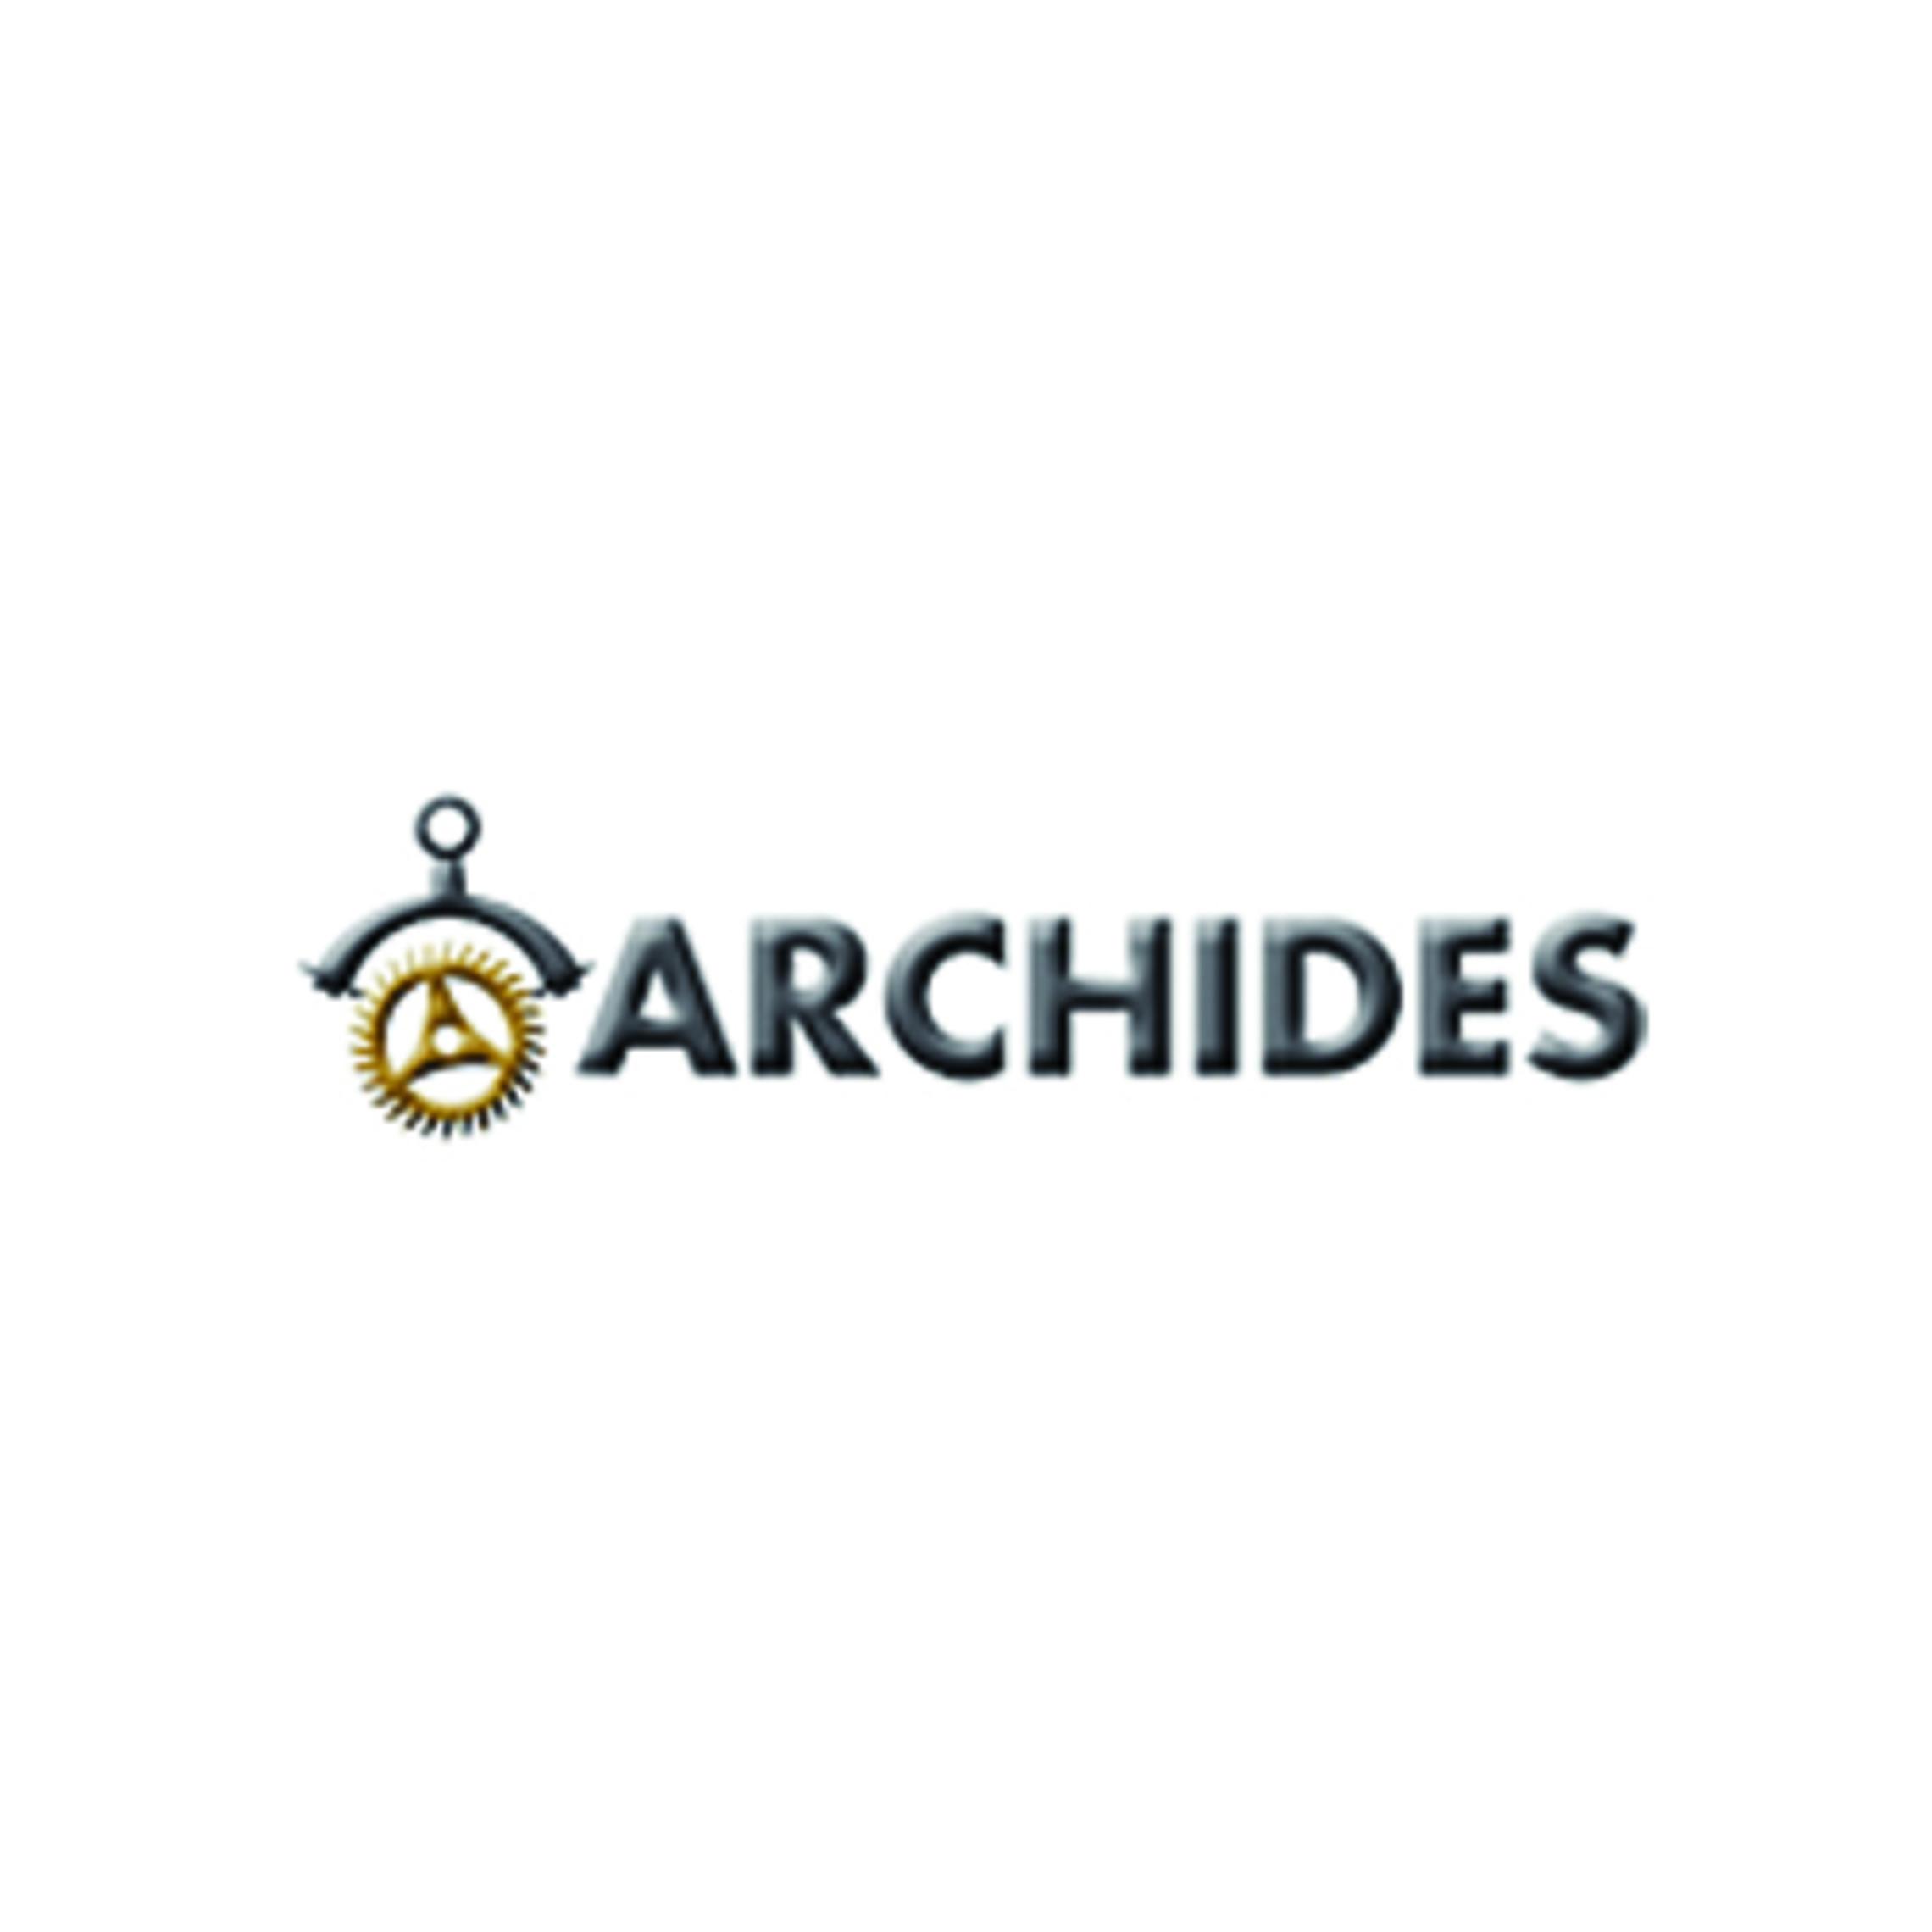 archides- company logo